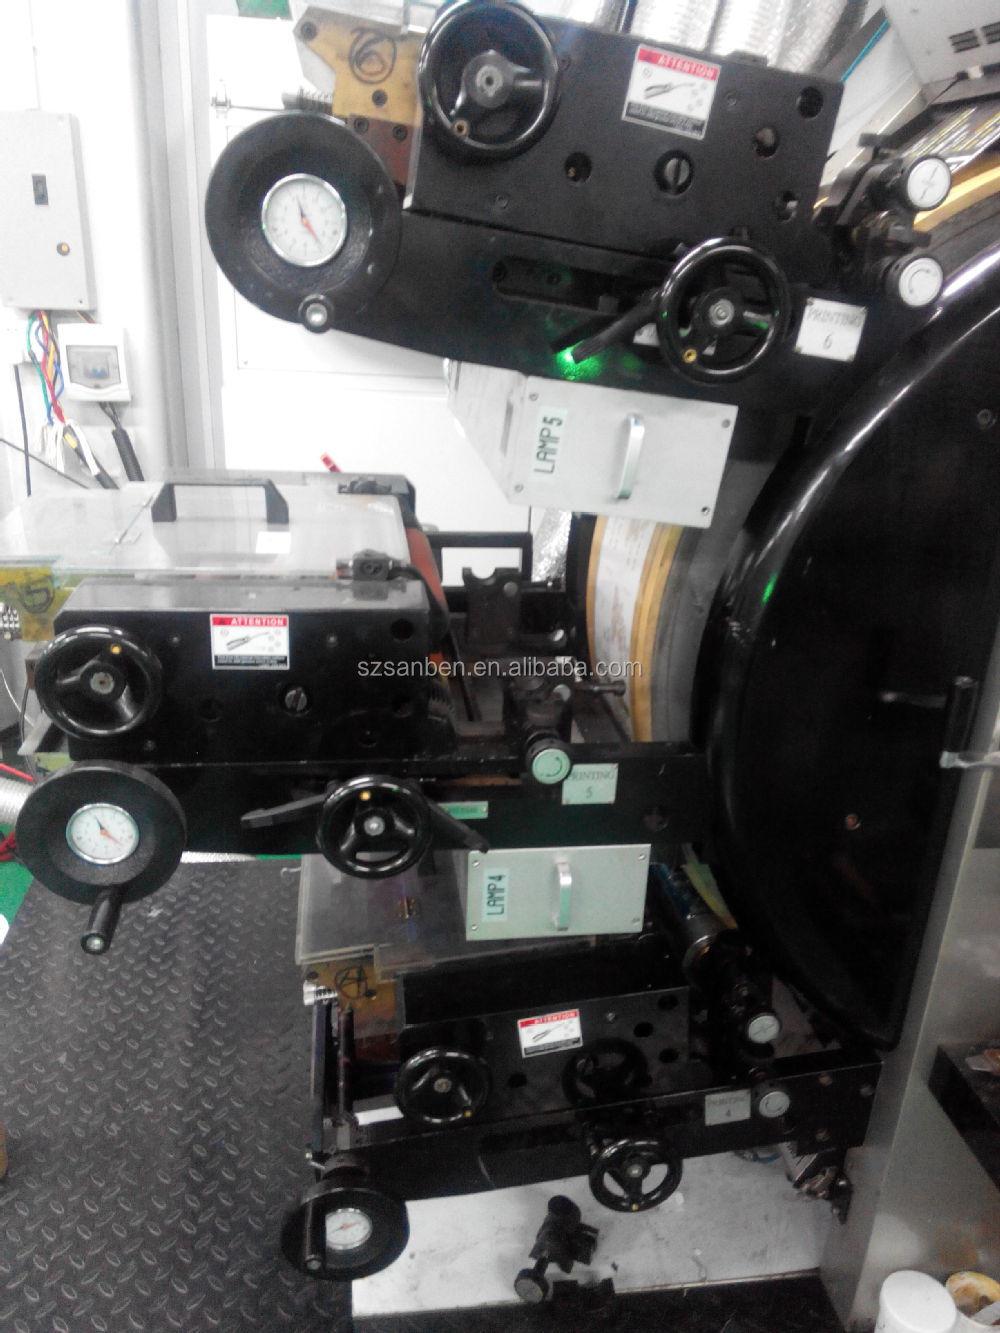 sbl-300) Letterpress Label Printing Machine,Automatic Satallite ...